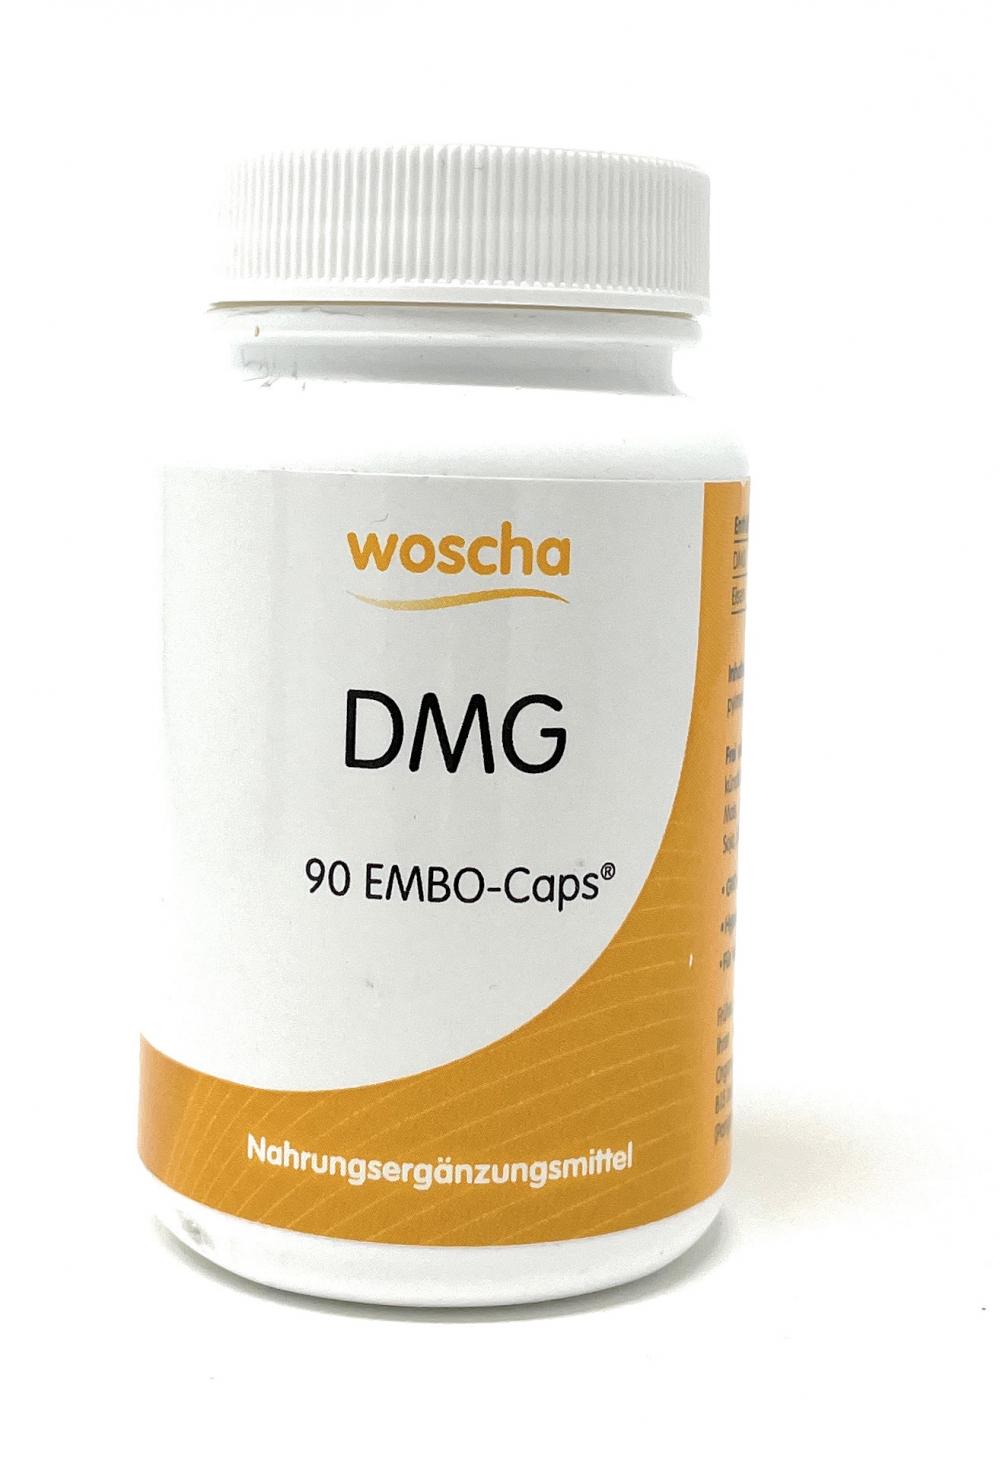 woscha DMG 90 Embo-Caps (28g)(vegan)